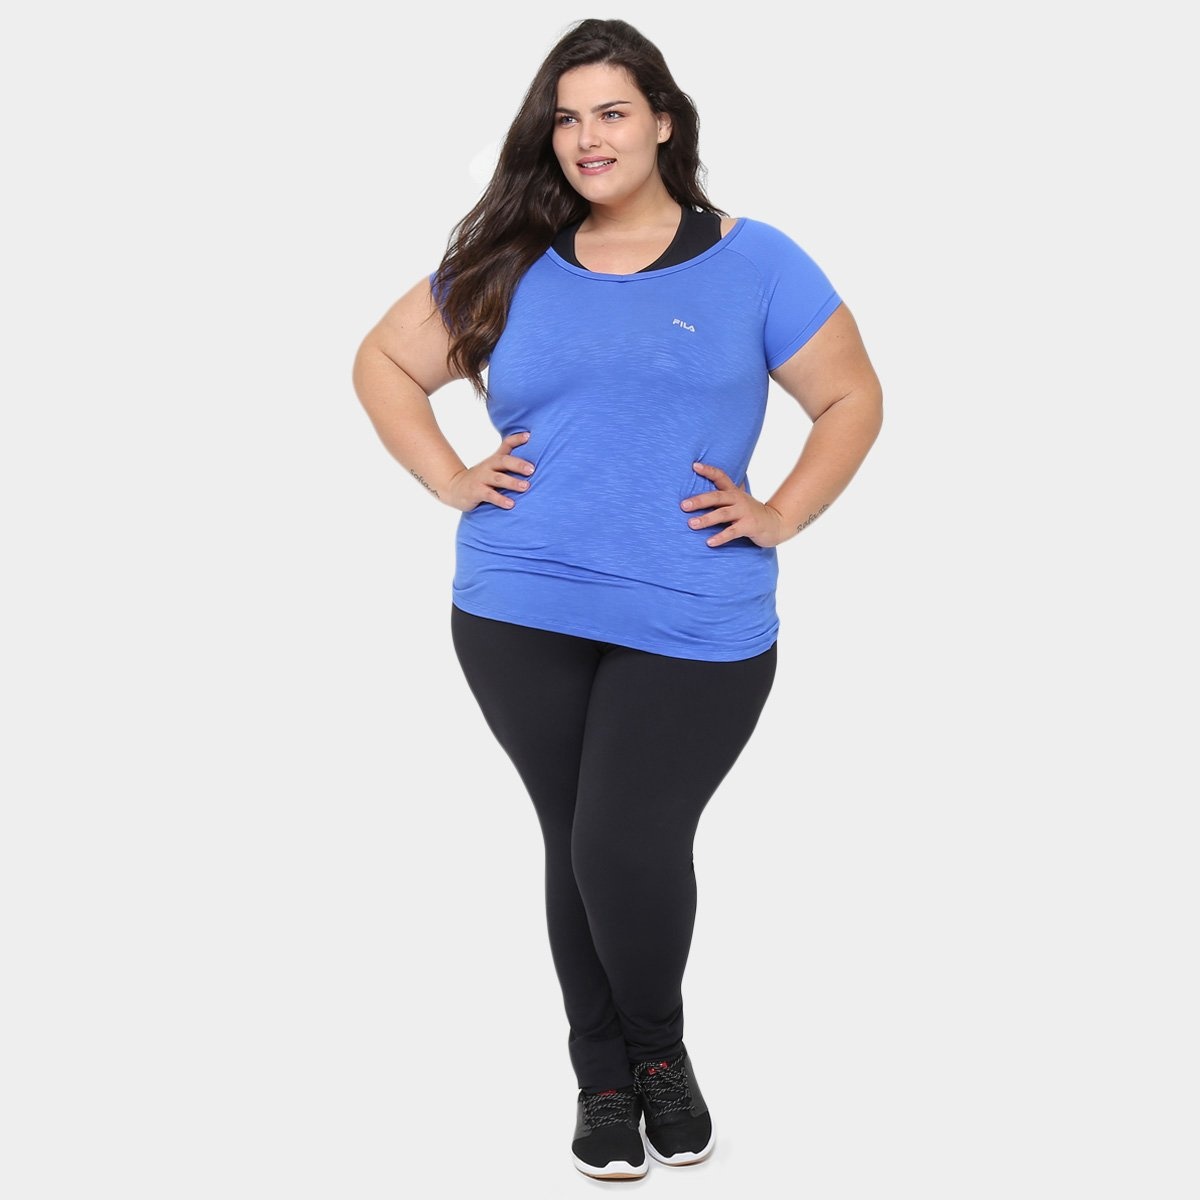 Fila Size Size Plus Camiseta Fila Match Azul Feminina Plus Camiseta Crwr5aAcqx